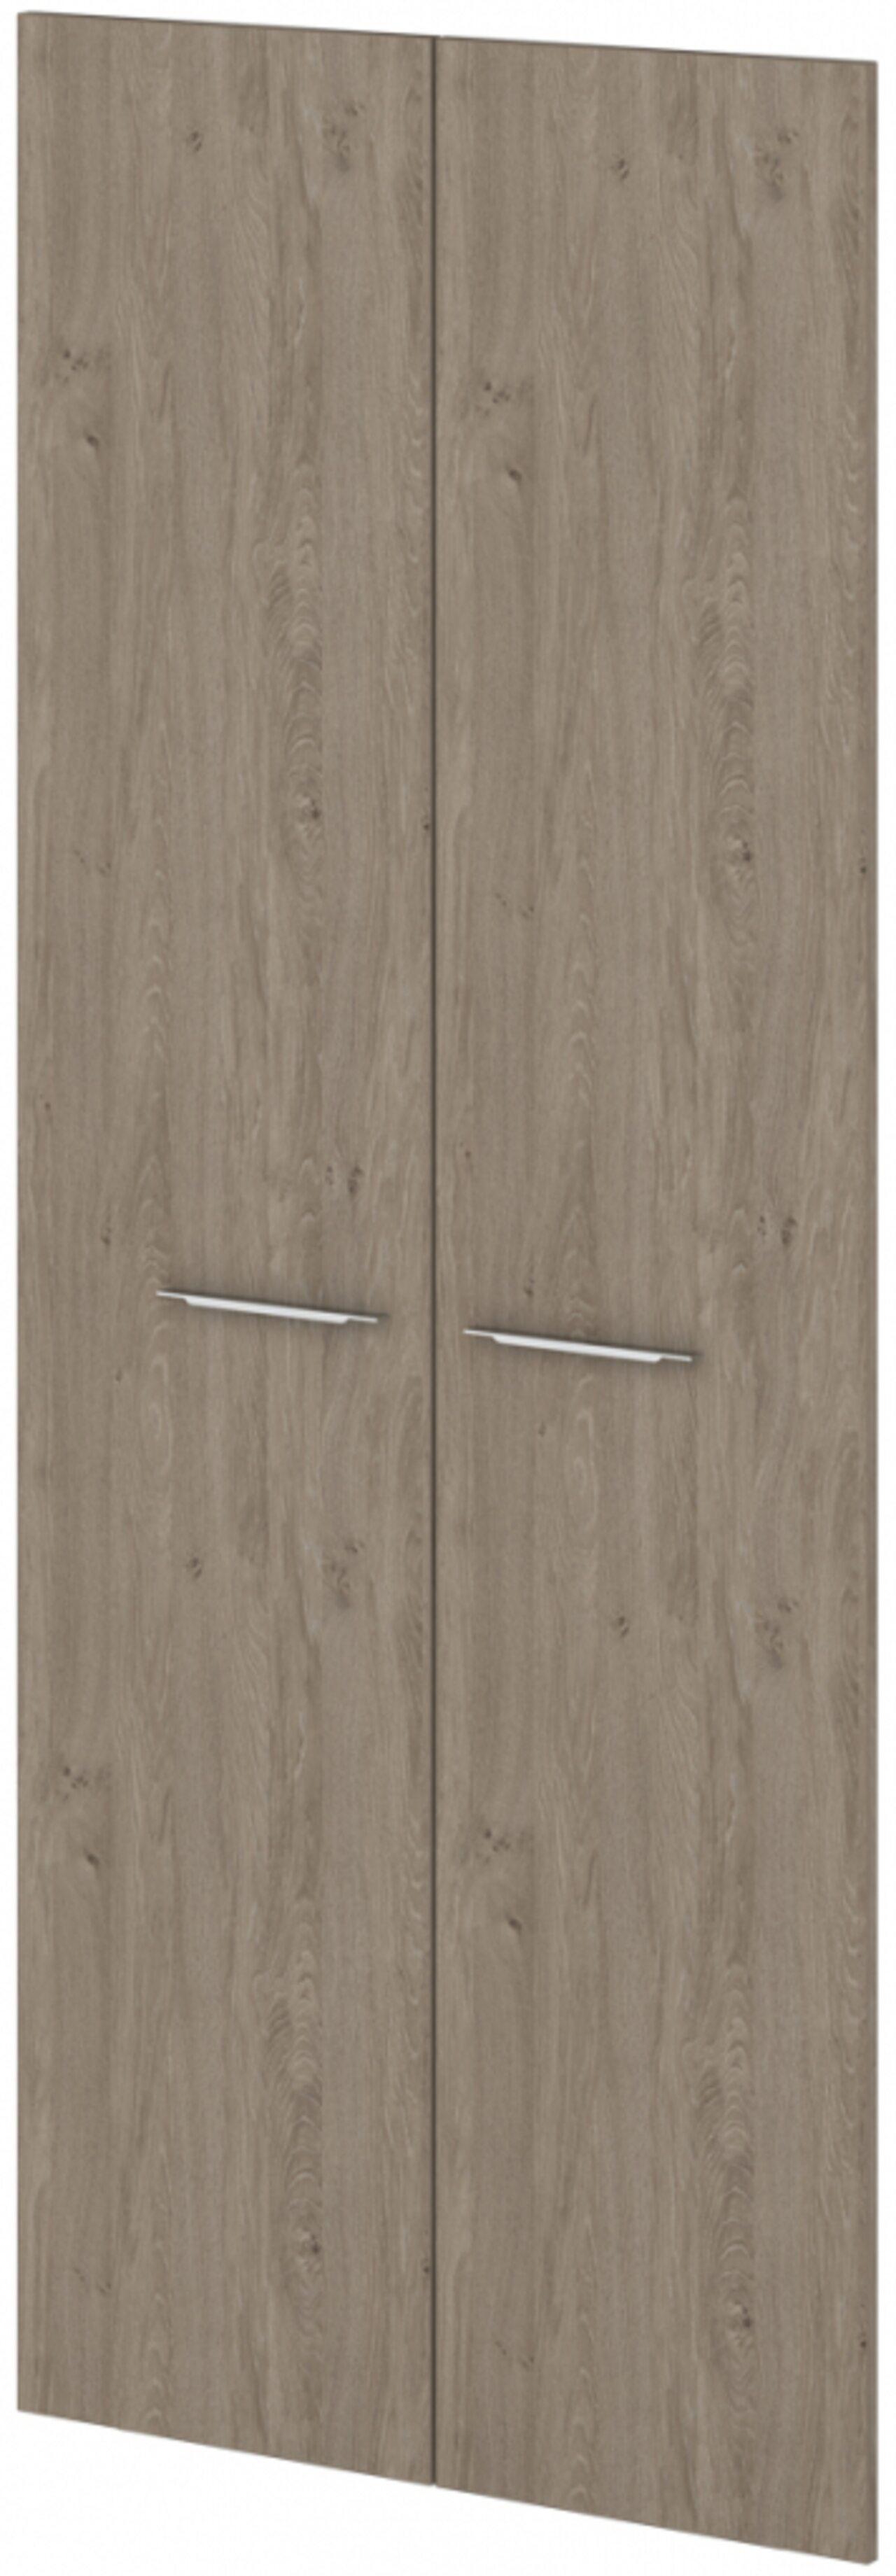 Двери ЛДСП высокие  Grandeza 2x90x221 - фото 3